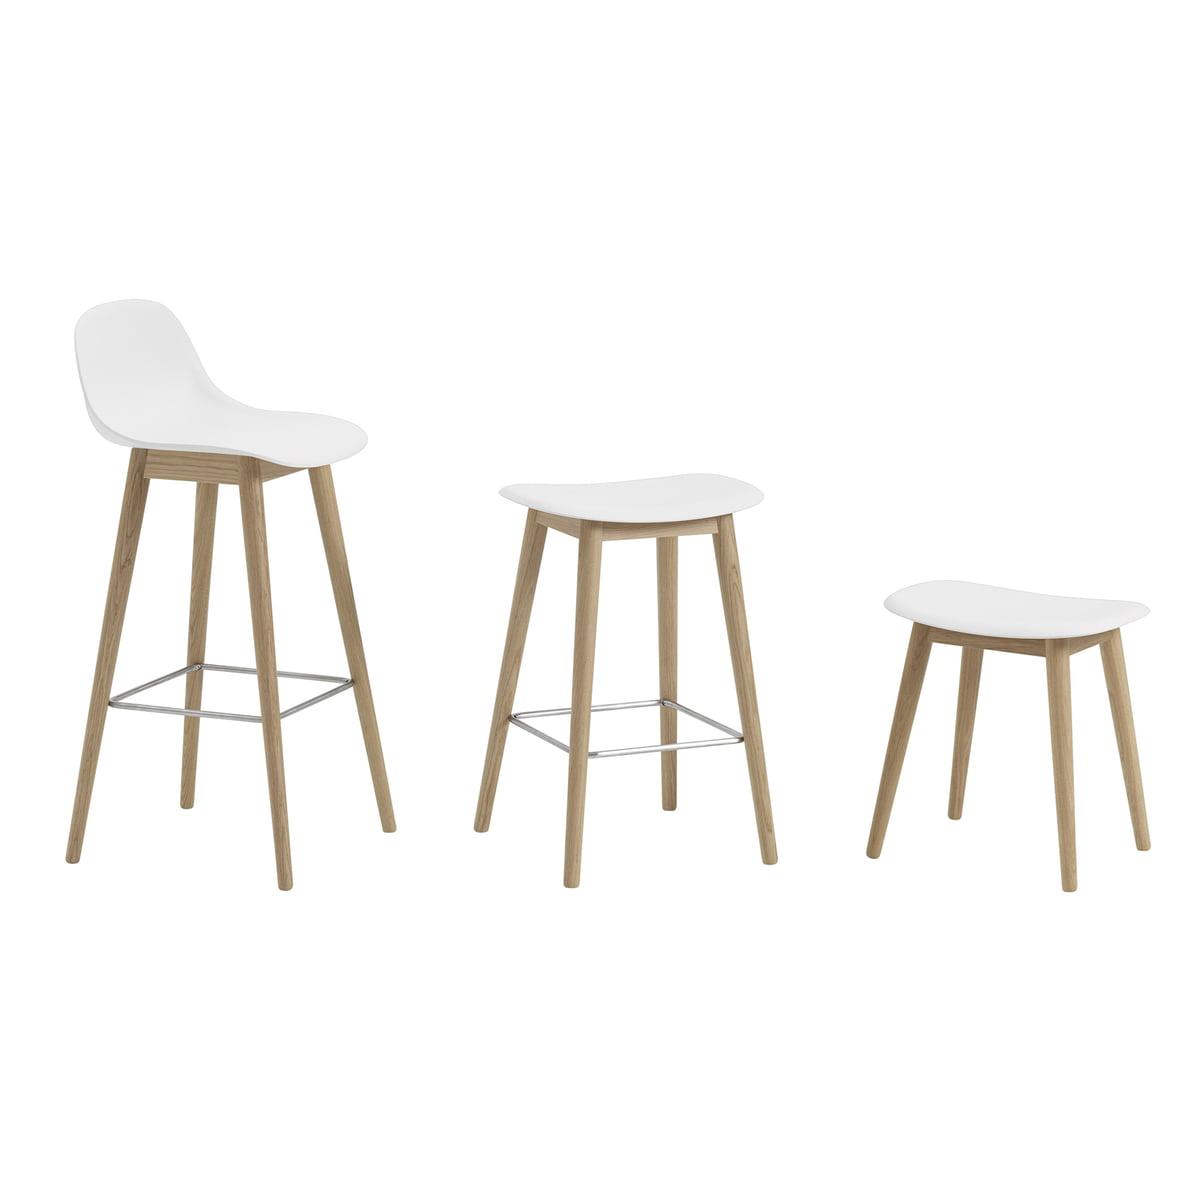 Superb Muuto Fiber Stool Wood Base Natural Oak White Beatyapartments Chair Design Images Beatyapartmentscom